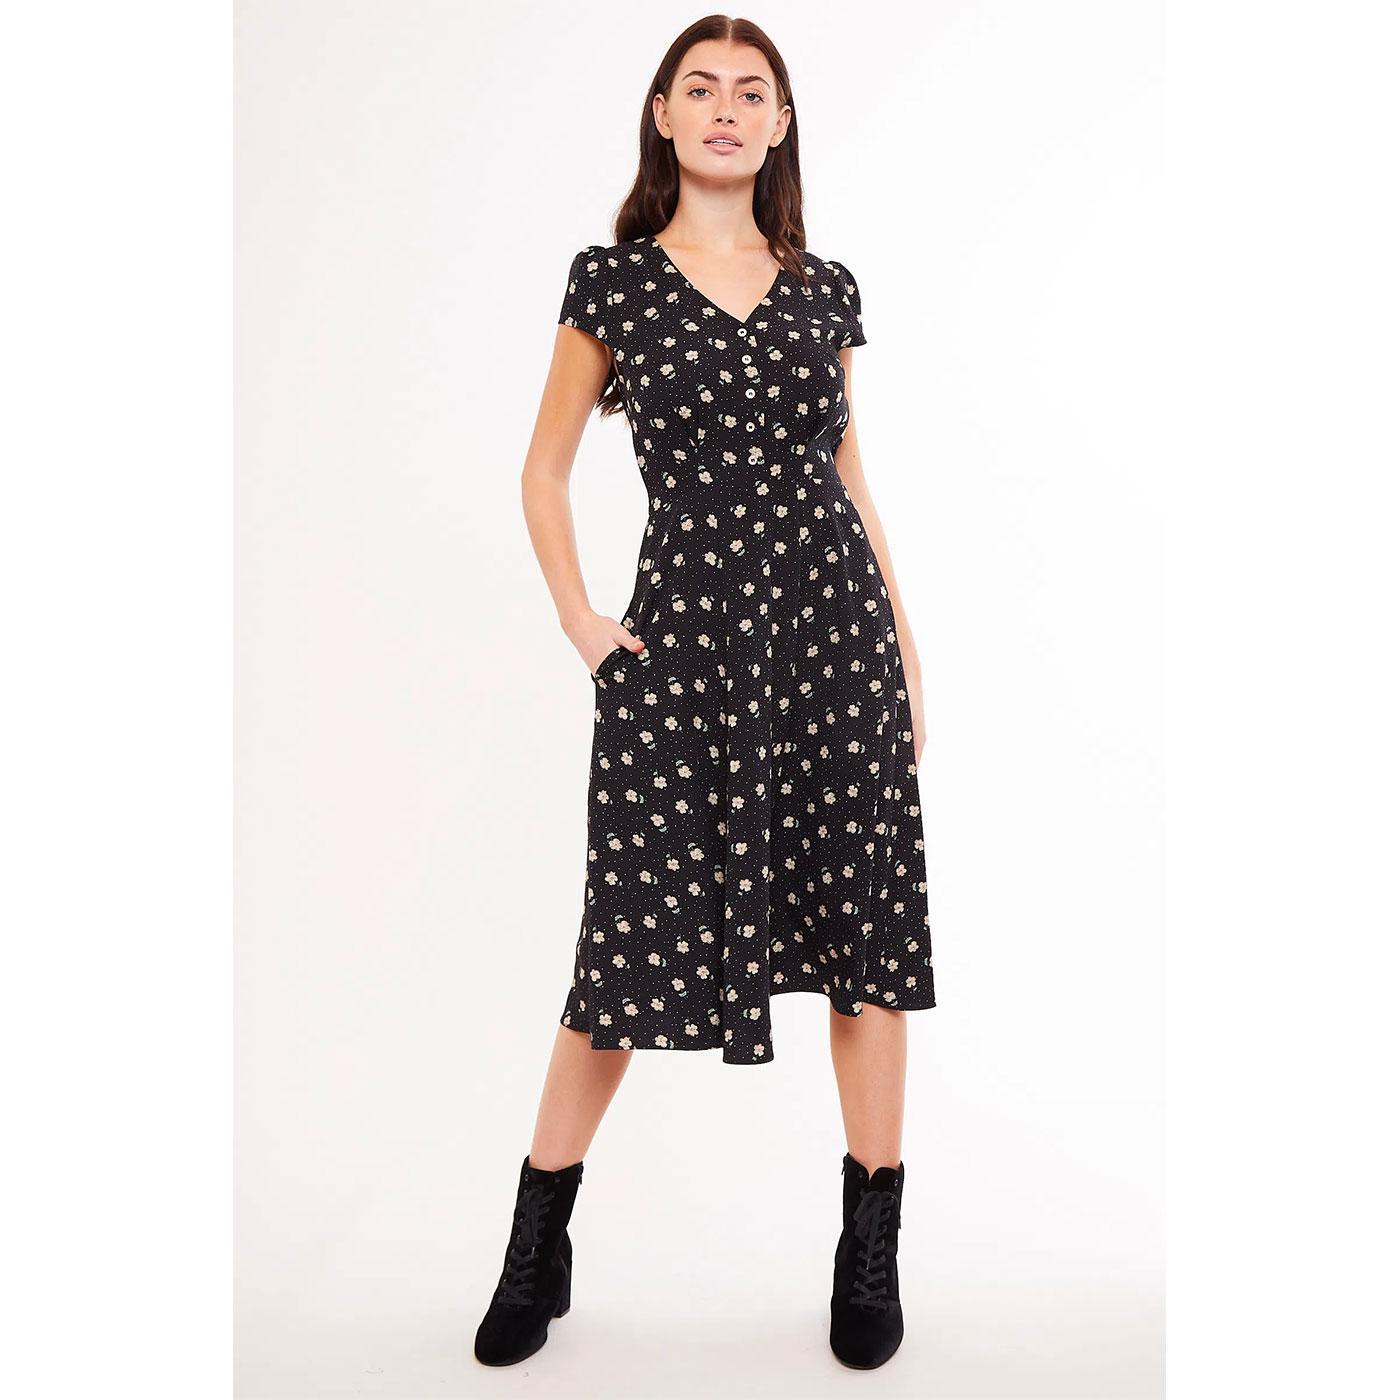 Cathleen LOUCHE Retro Midi Dress in Black Anemone